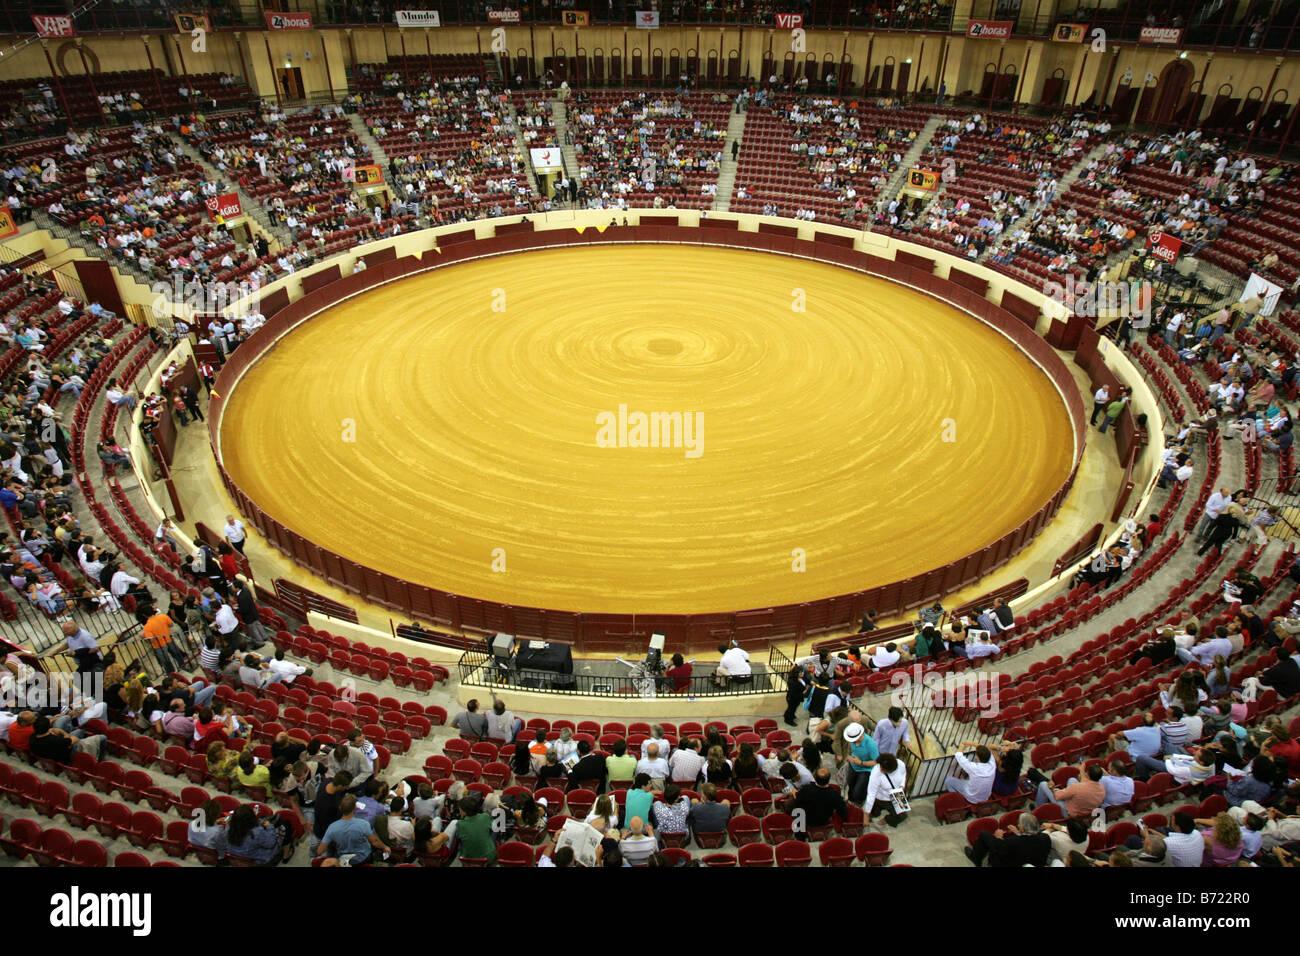 Campo Pequeno bullring, Lisbon, Portugal. - Stock Image